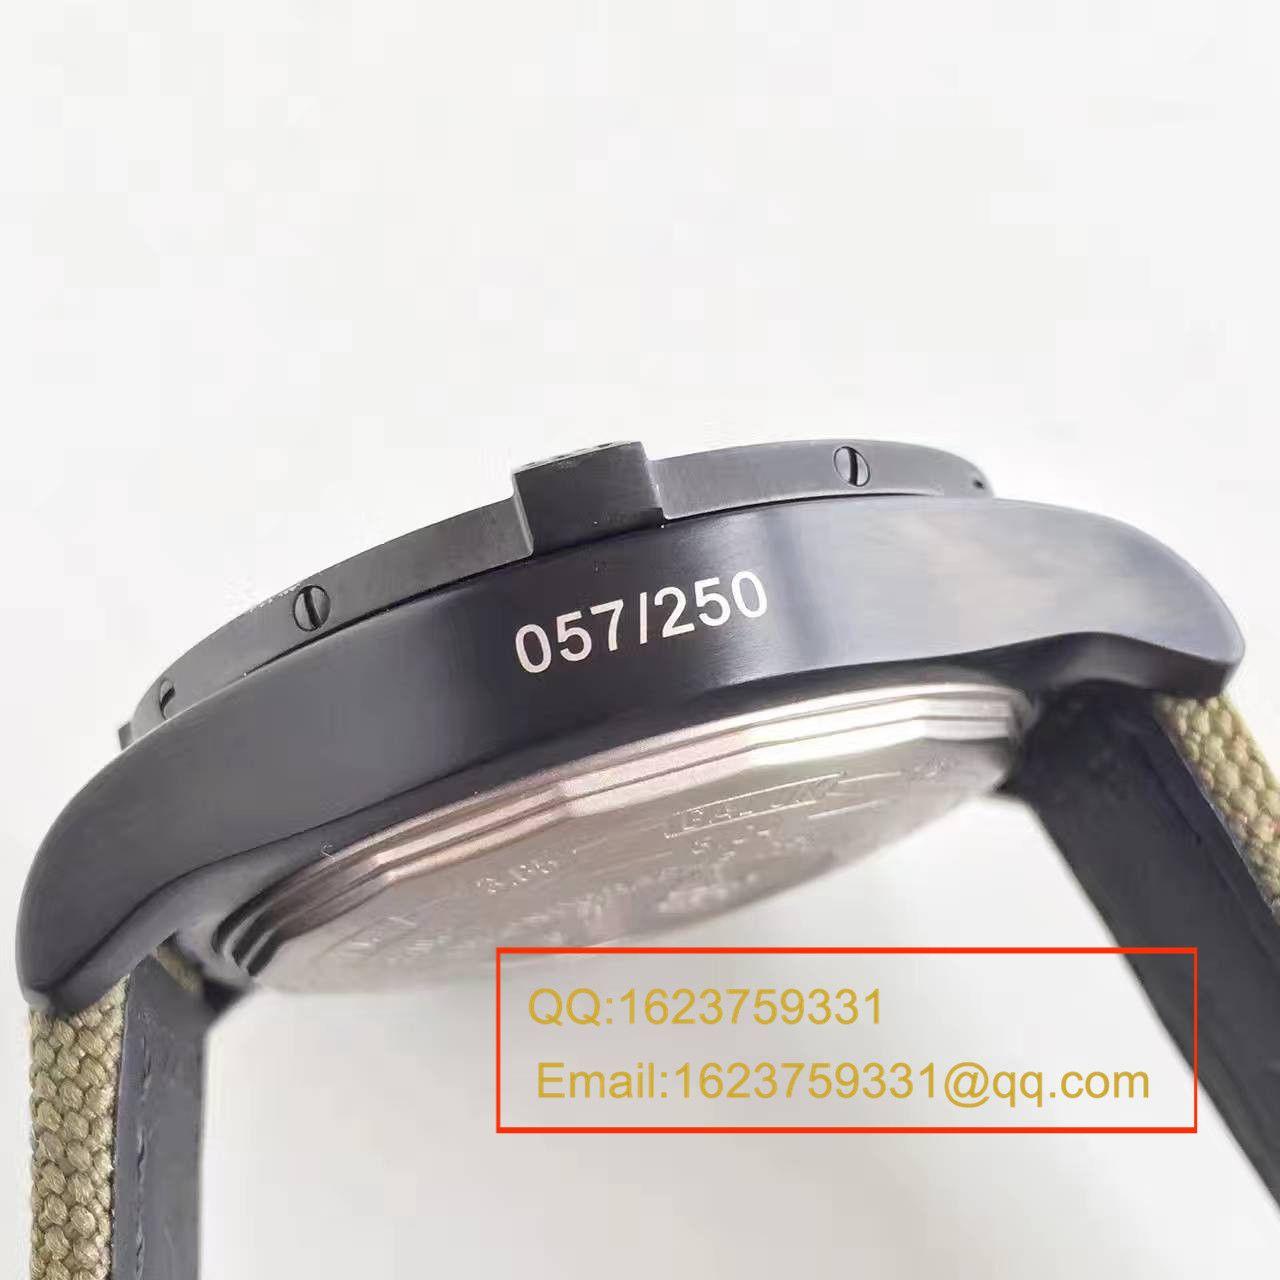 【GF1:1超A精仿手表】百年灵美军专用定制版复仇者Breitling USA military avenger II carbon fiber